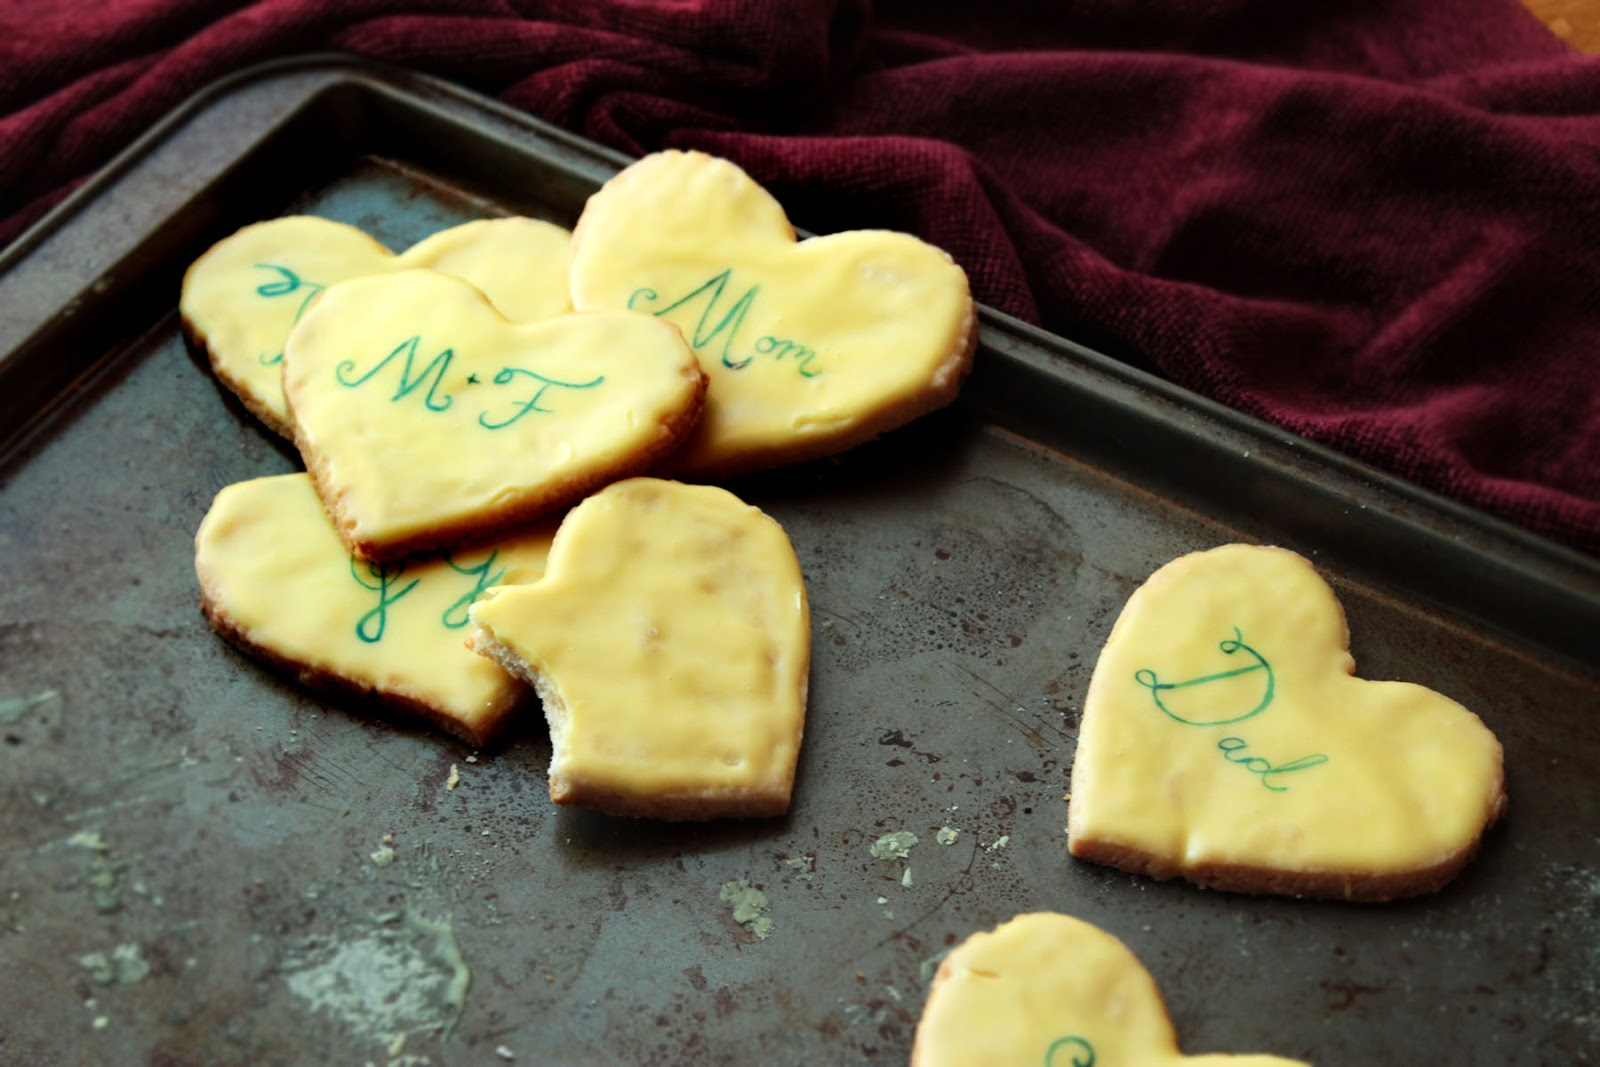 Food Nasty: Valentine's Day Lemon Shortbread Cookie!